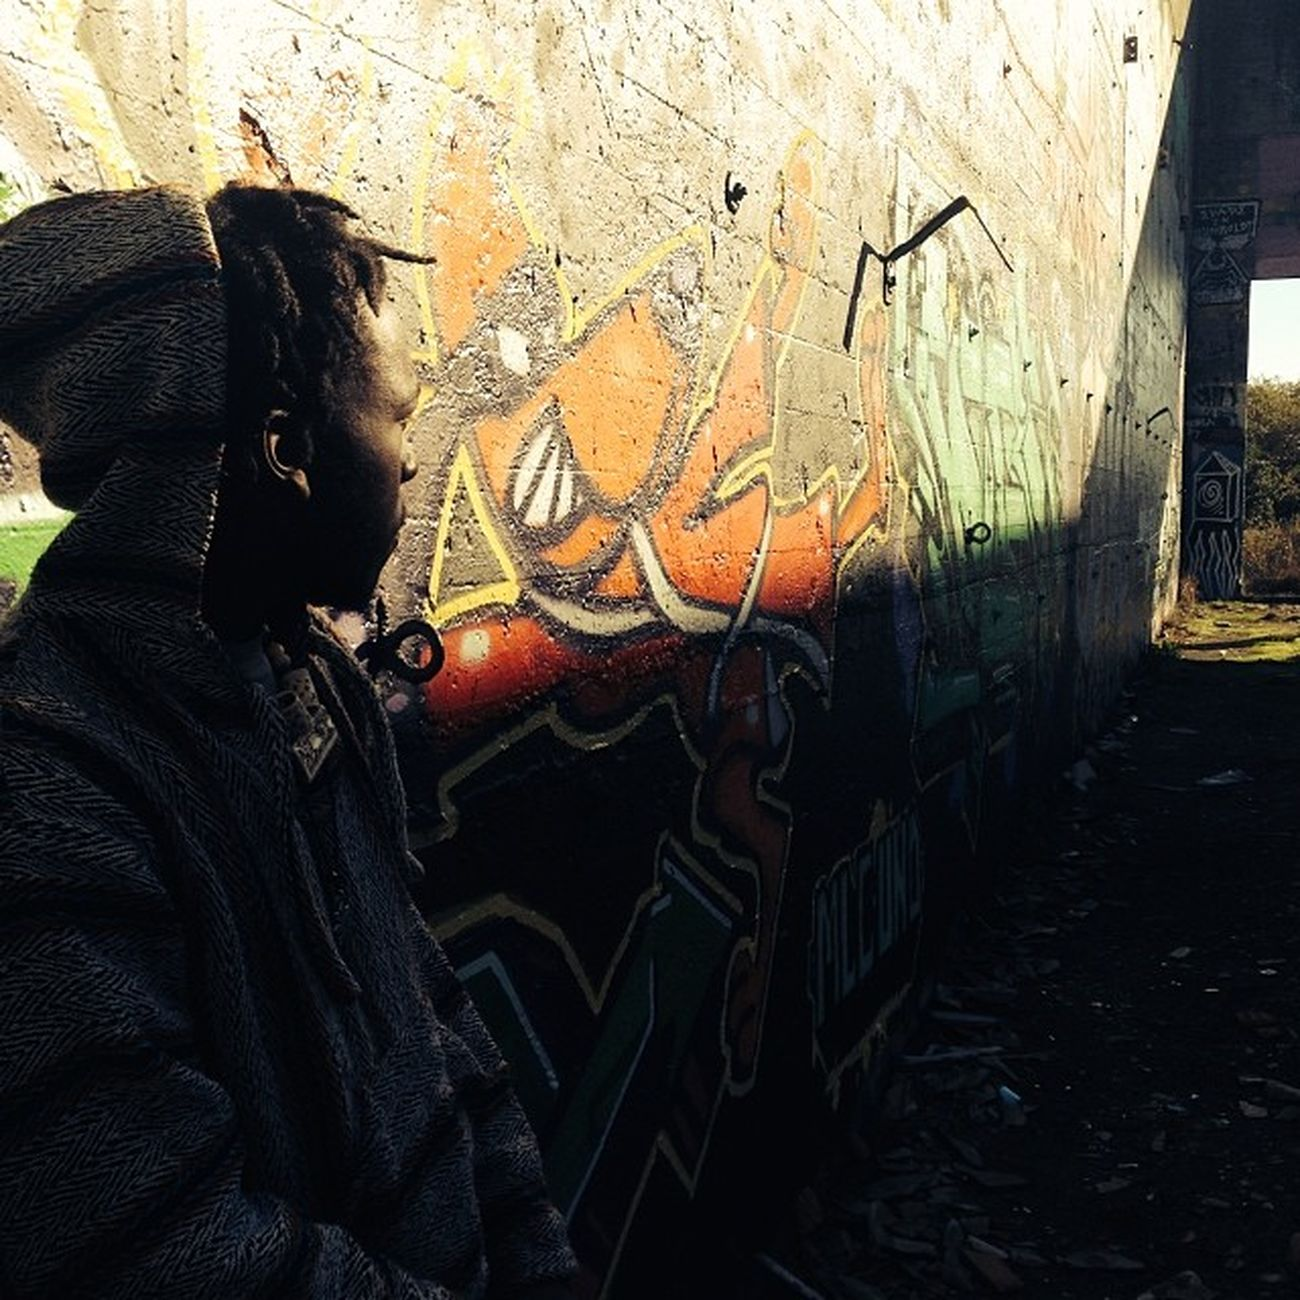 Pharaoh swag Art Graffiti UrbanART Nofilter Skycamp Campshit Caliswag Stonershit Weed 420 Instadank Instagood Highsociety Gethigher L4l F4F Topshelflife Weedstagram